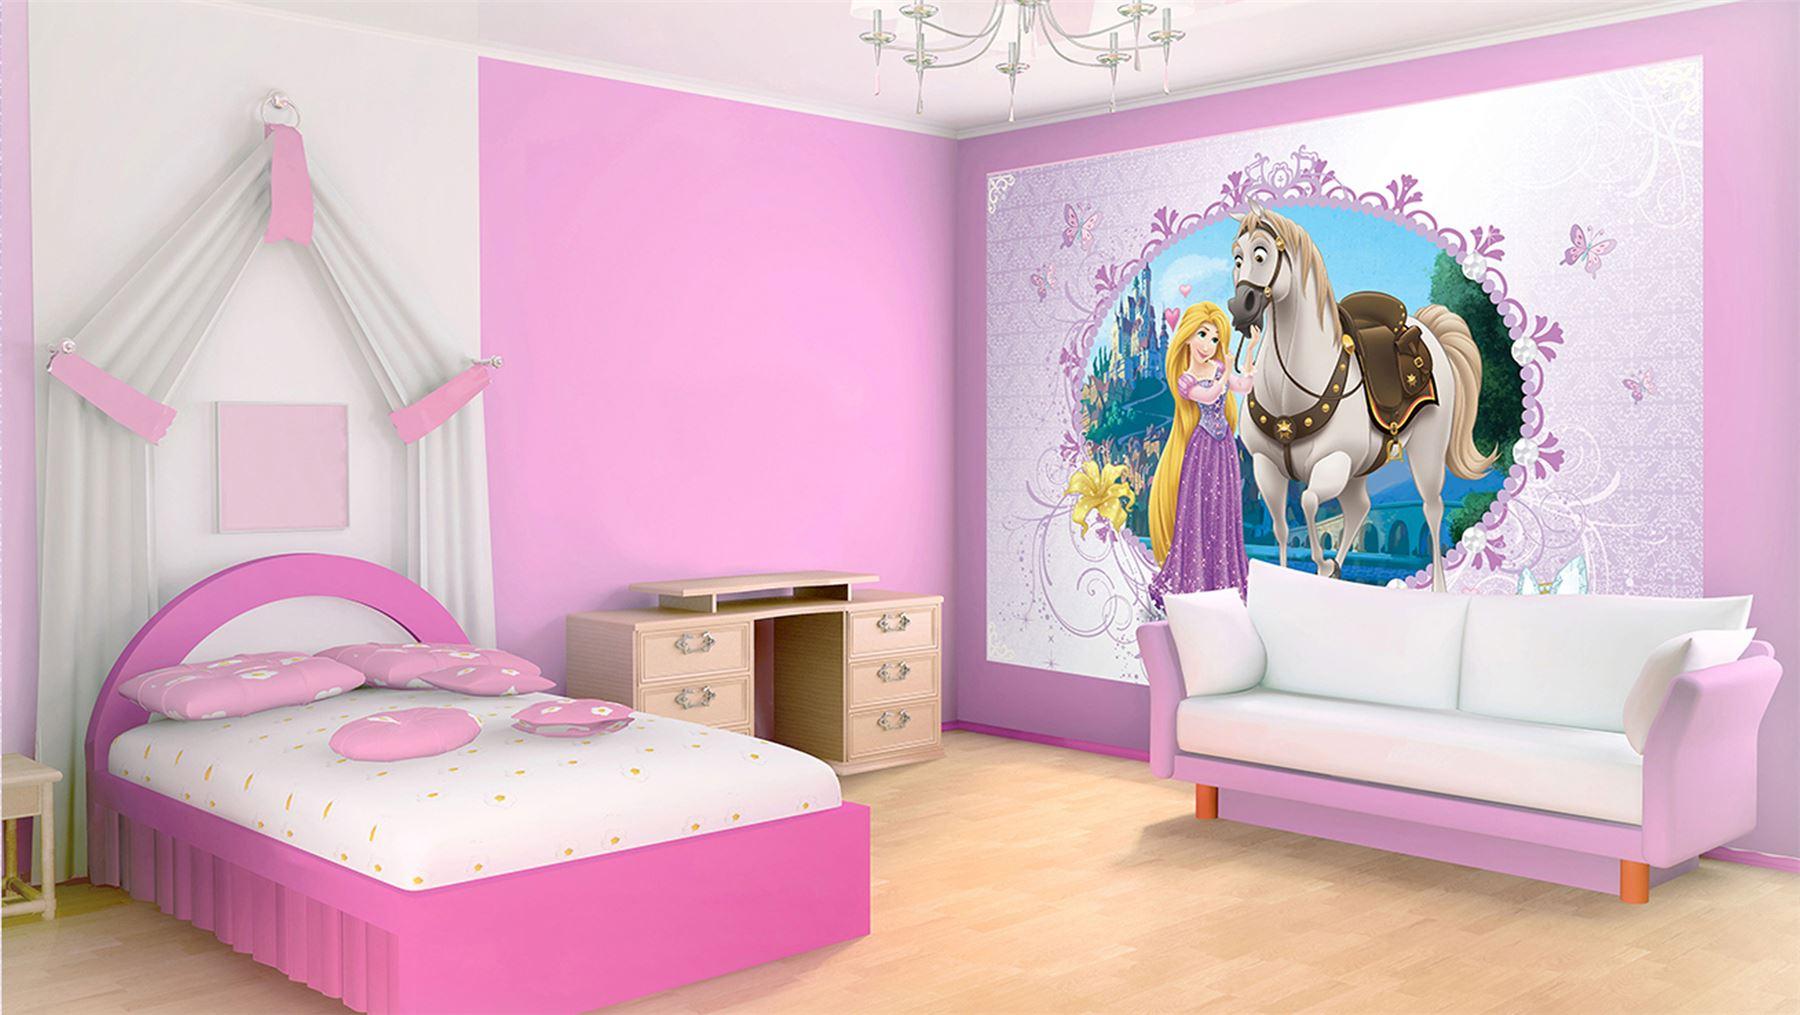 grande fresque murale raiponce maximus princesse disney lesaccessoires. Black Bedroom Furniture Sets. Home Design Ideas